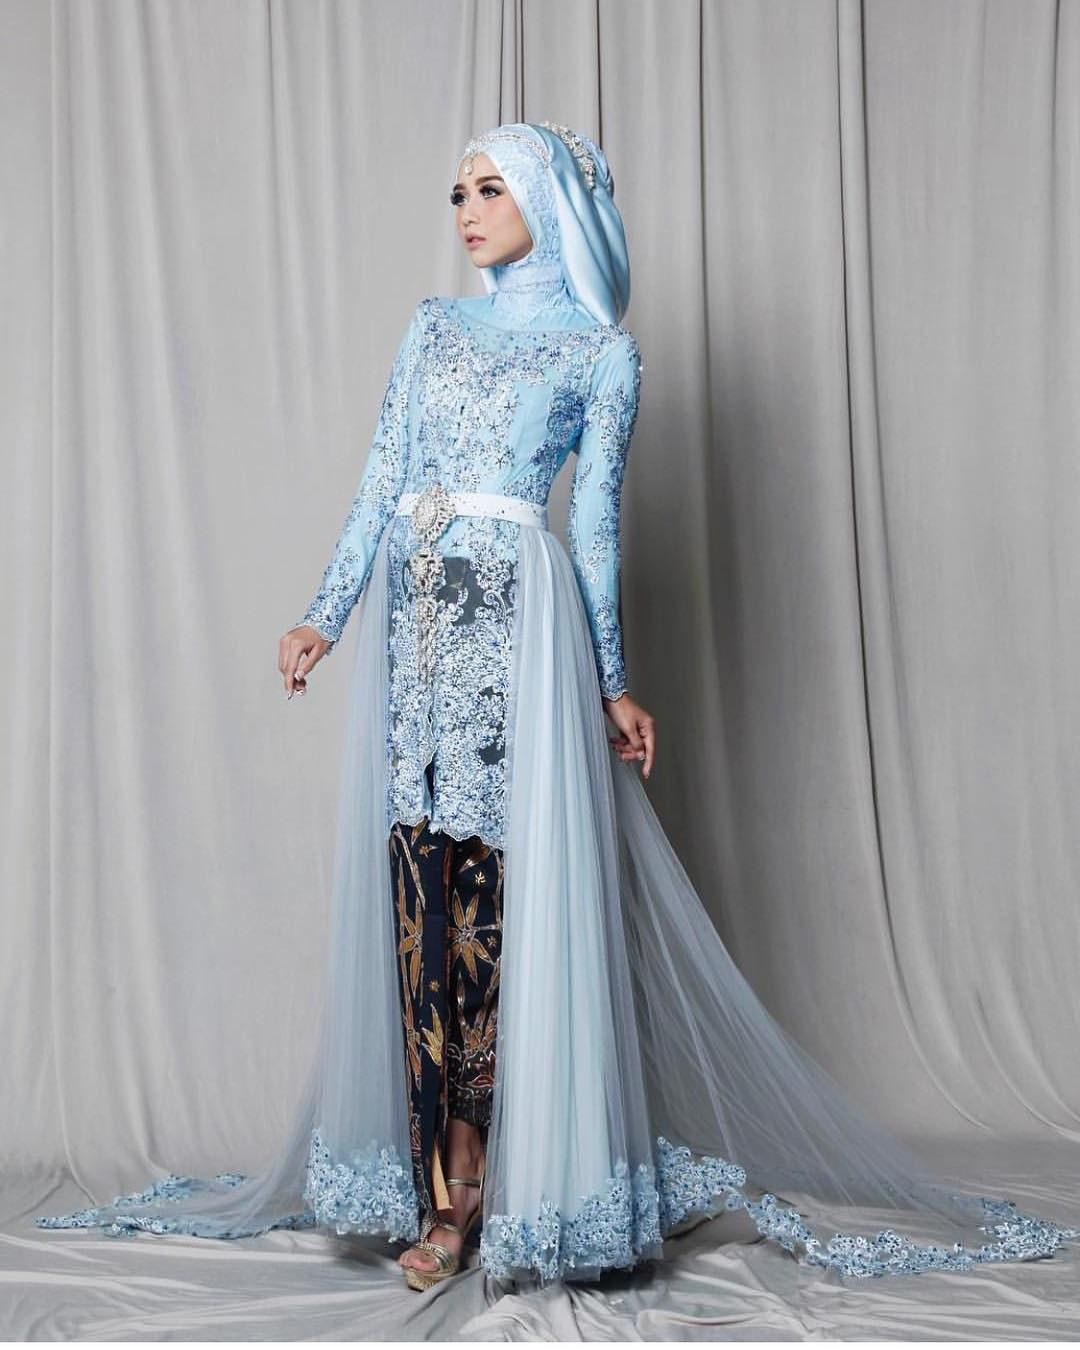 Bentuk Harga Gaun Pengantin Muslimah Syar'i Gdd0 17 Model Baju Pengantin Muslim 2018 Desain Elegan Cantik